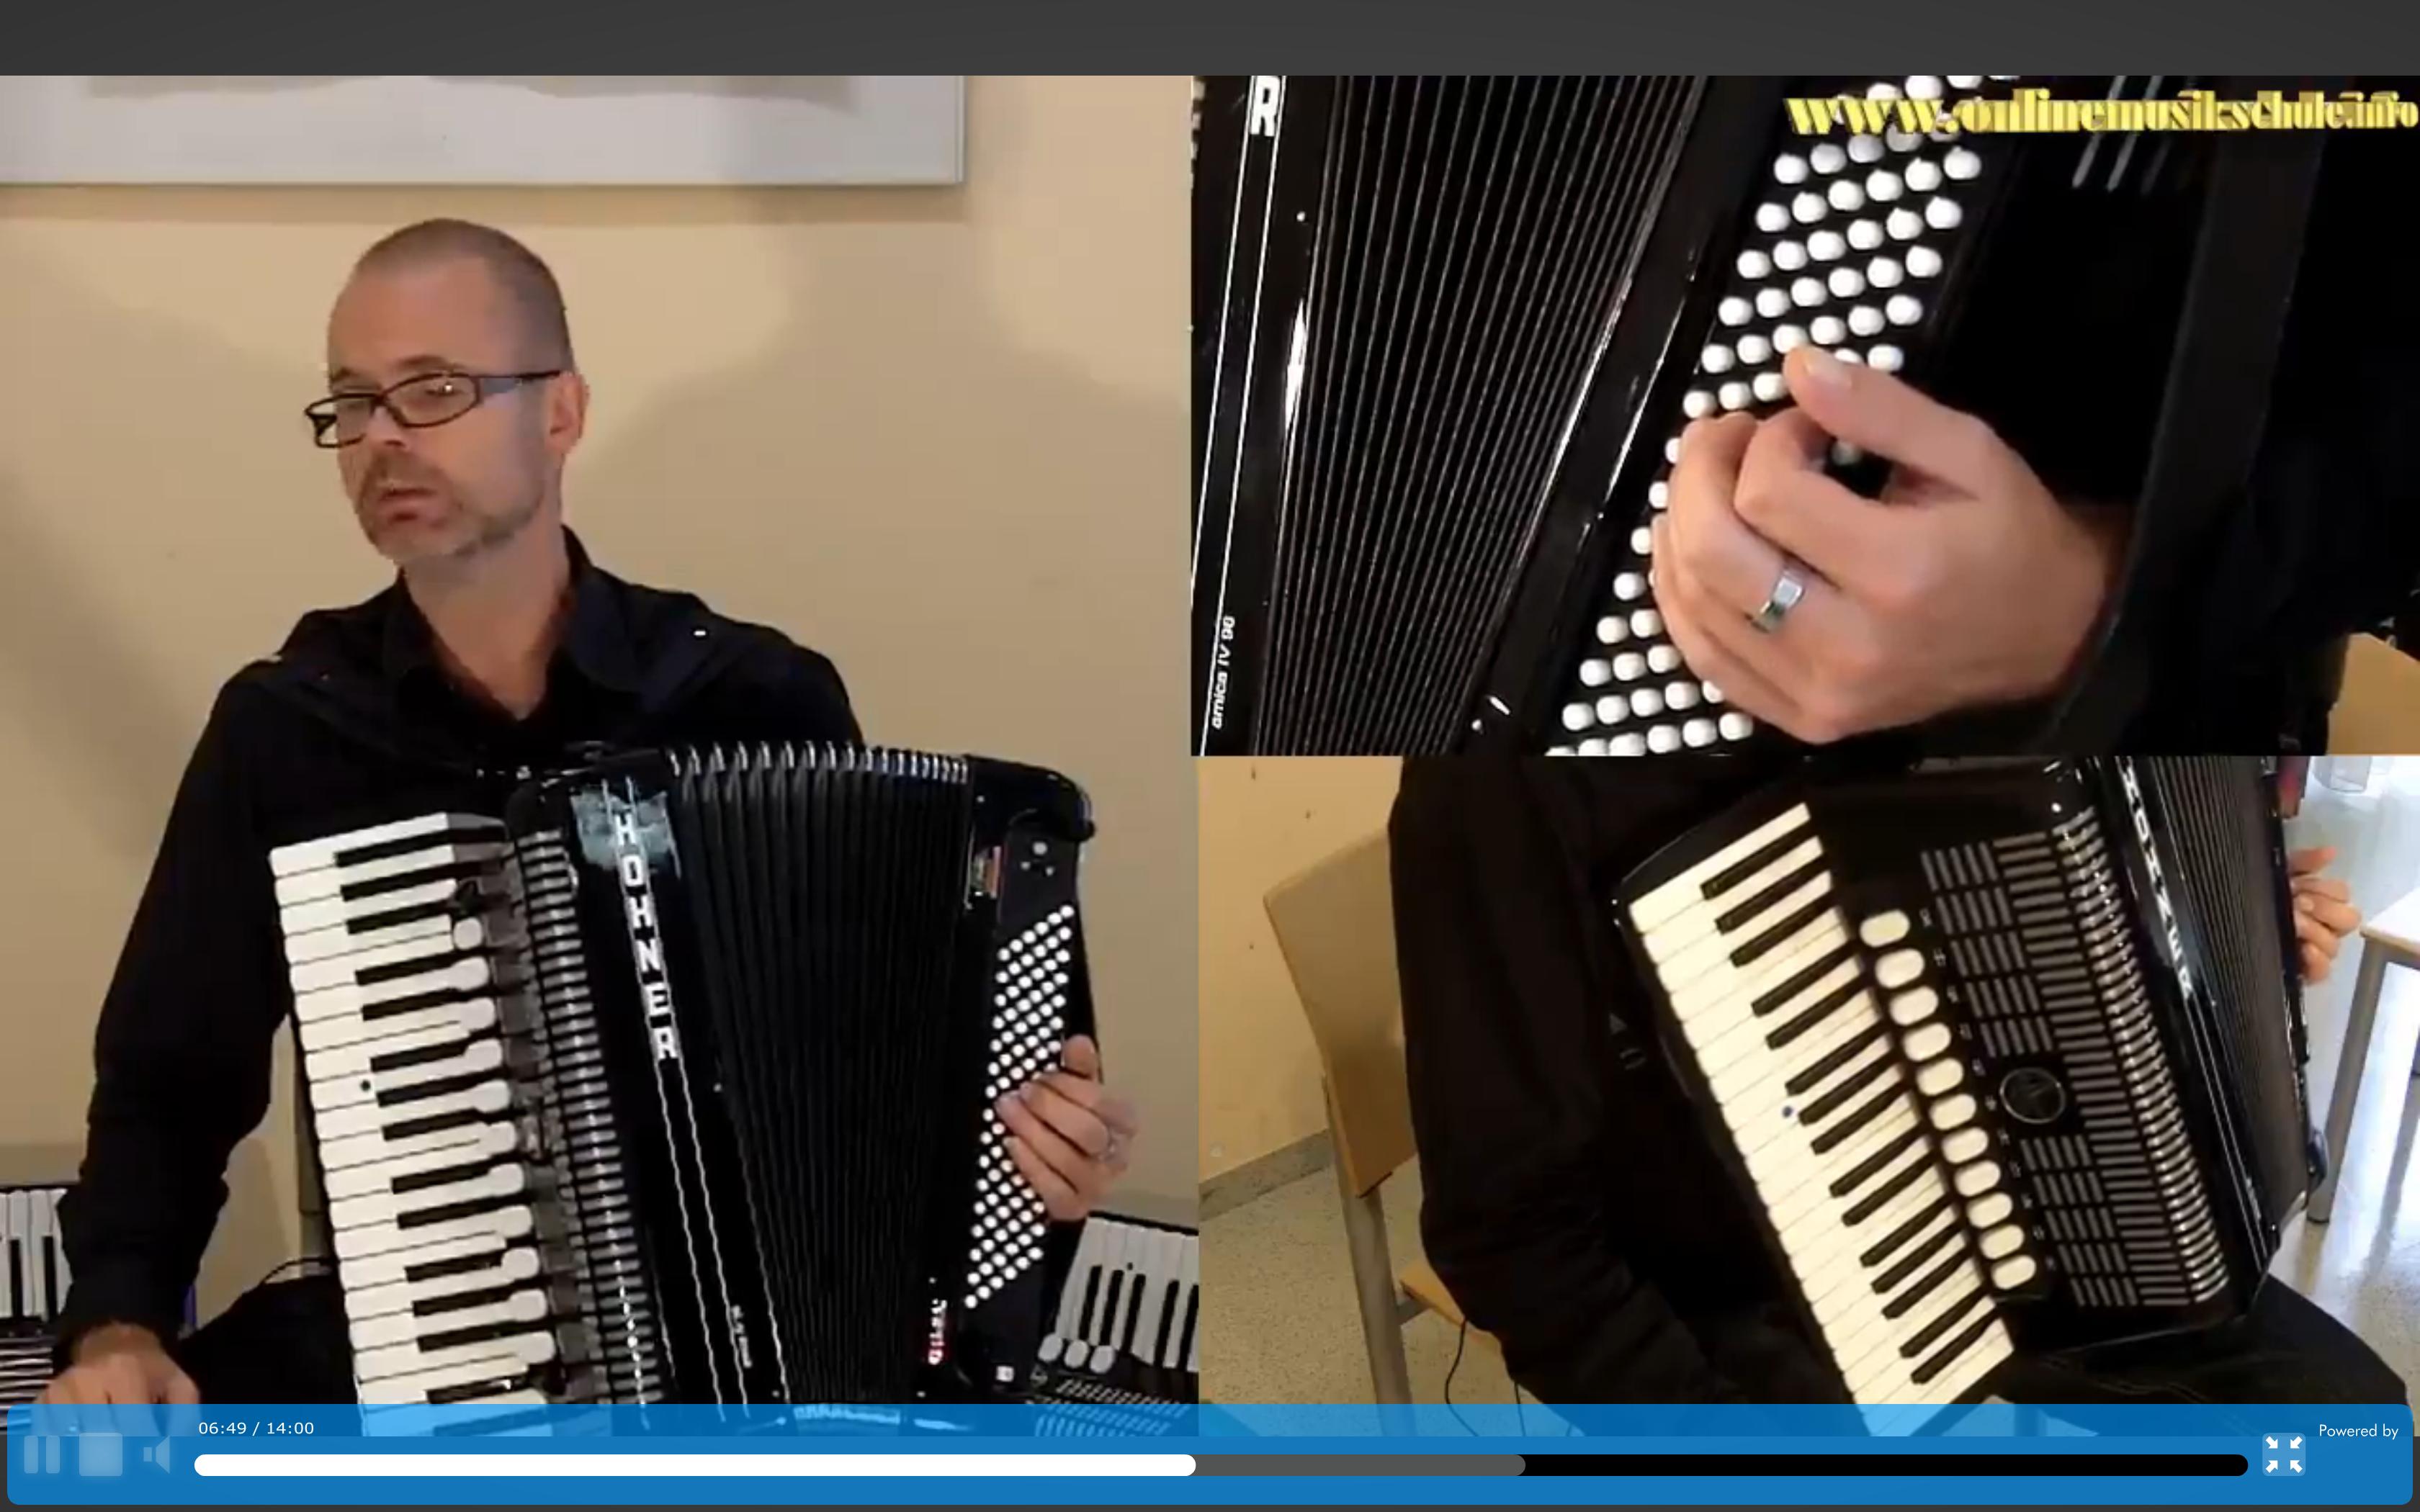 akkordeon lernen onlinemusikschule kurs 3